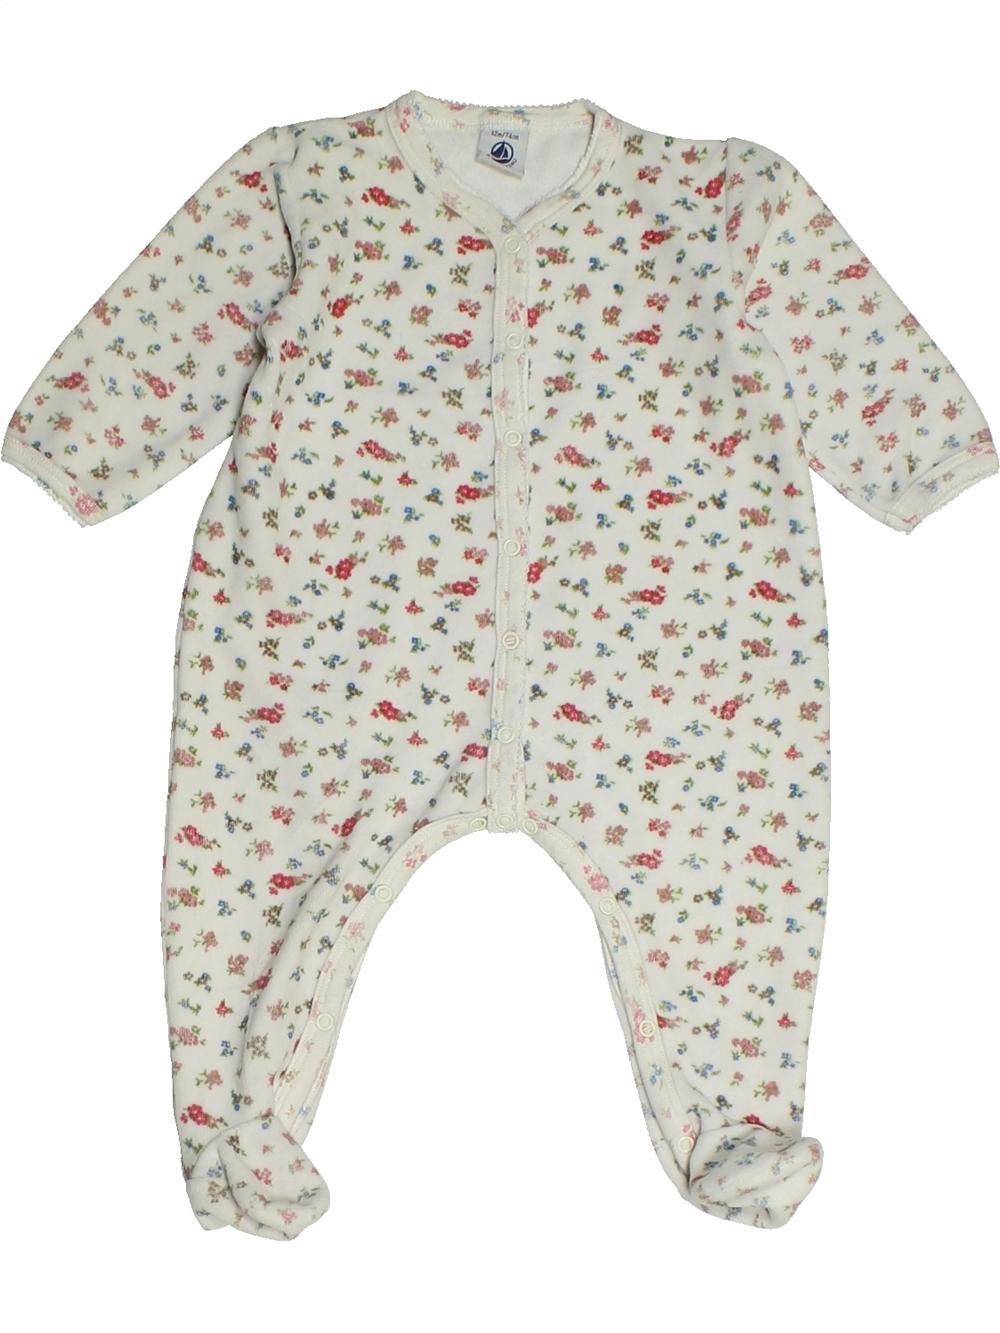 Pyjama-1-piece-bebe-fille-PETIT-BATEAU-12-mois-blanc-hiver-vetement-bebe